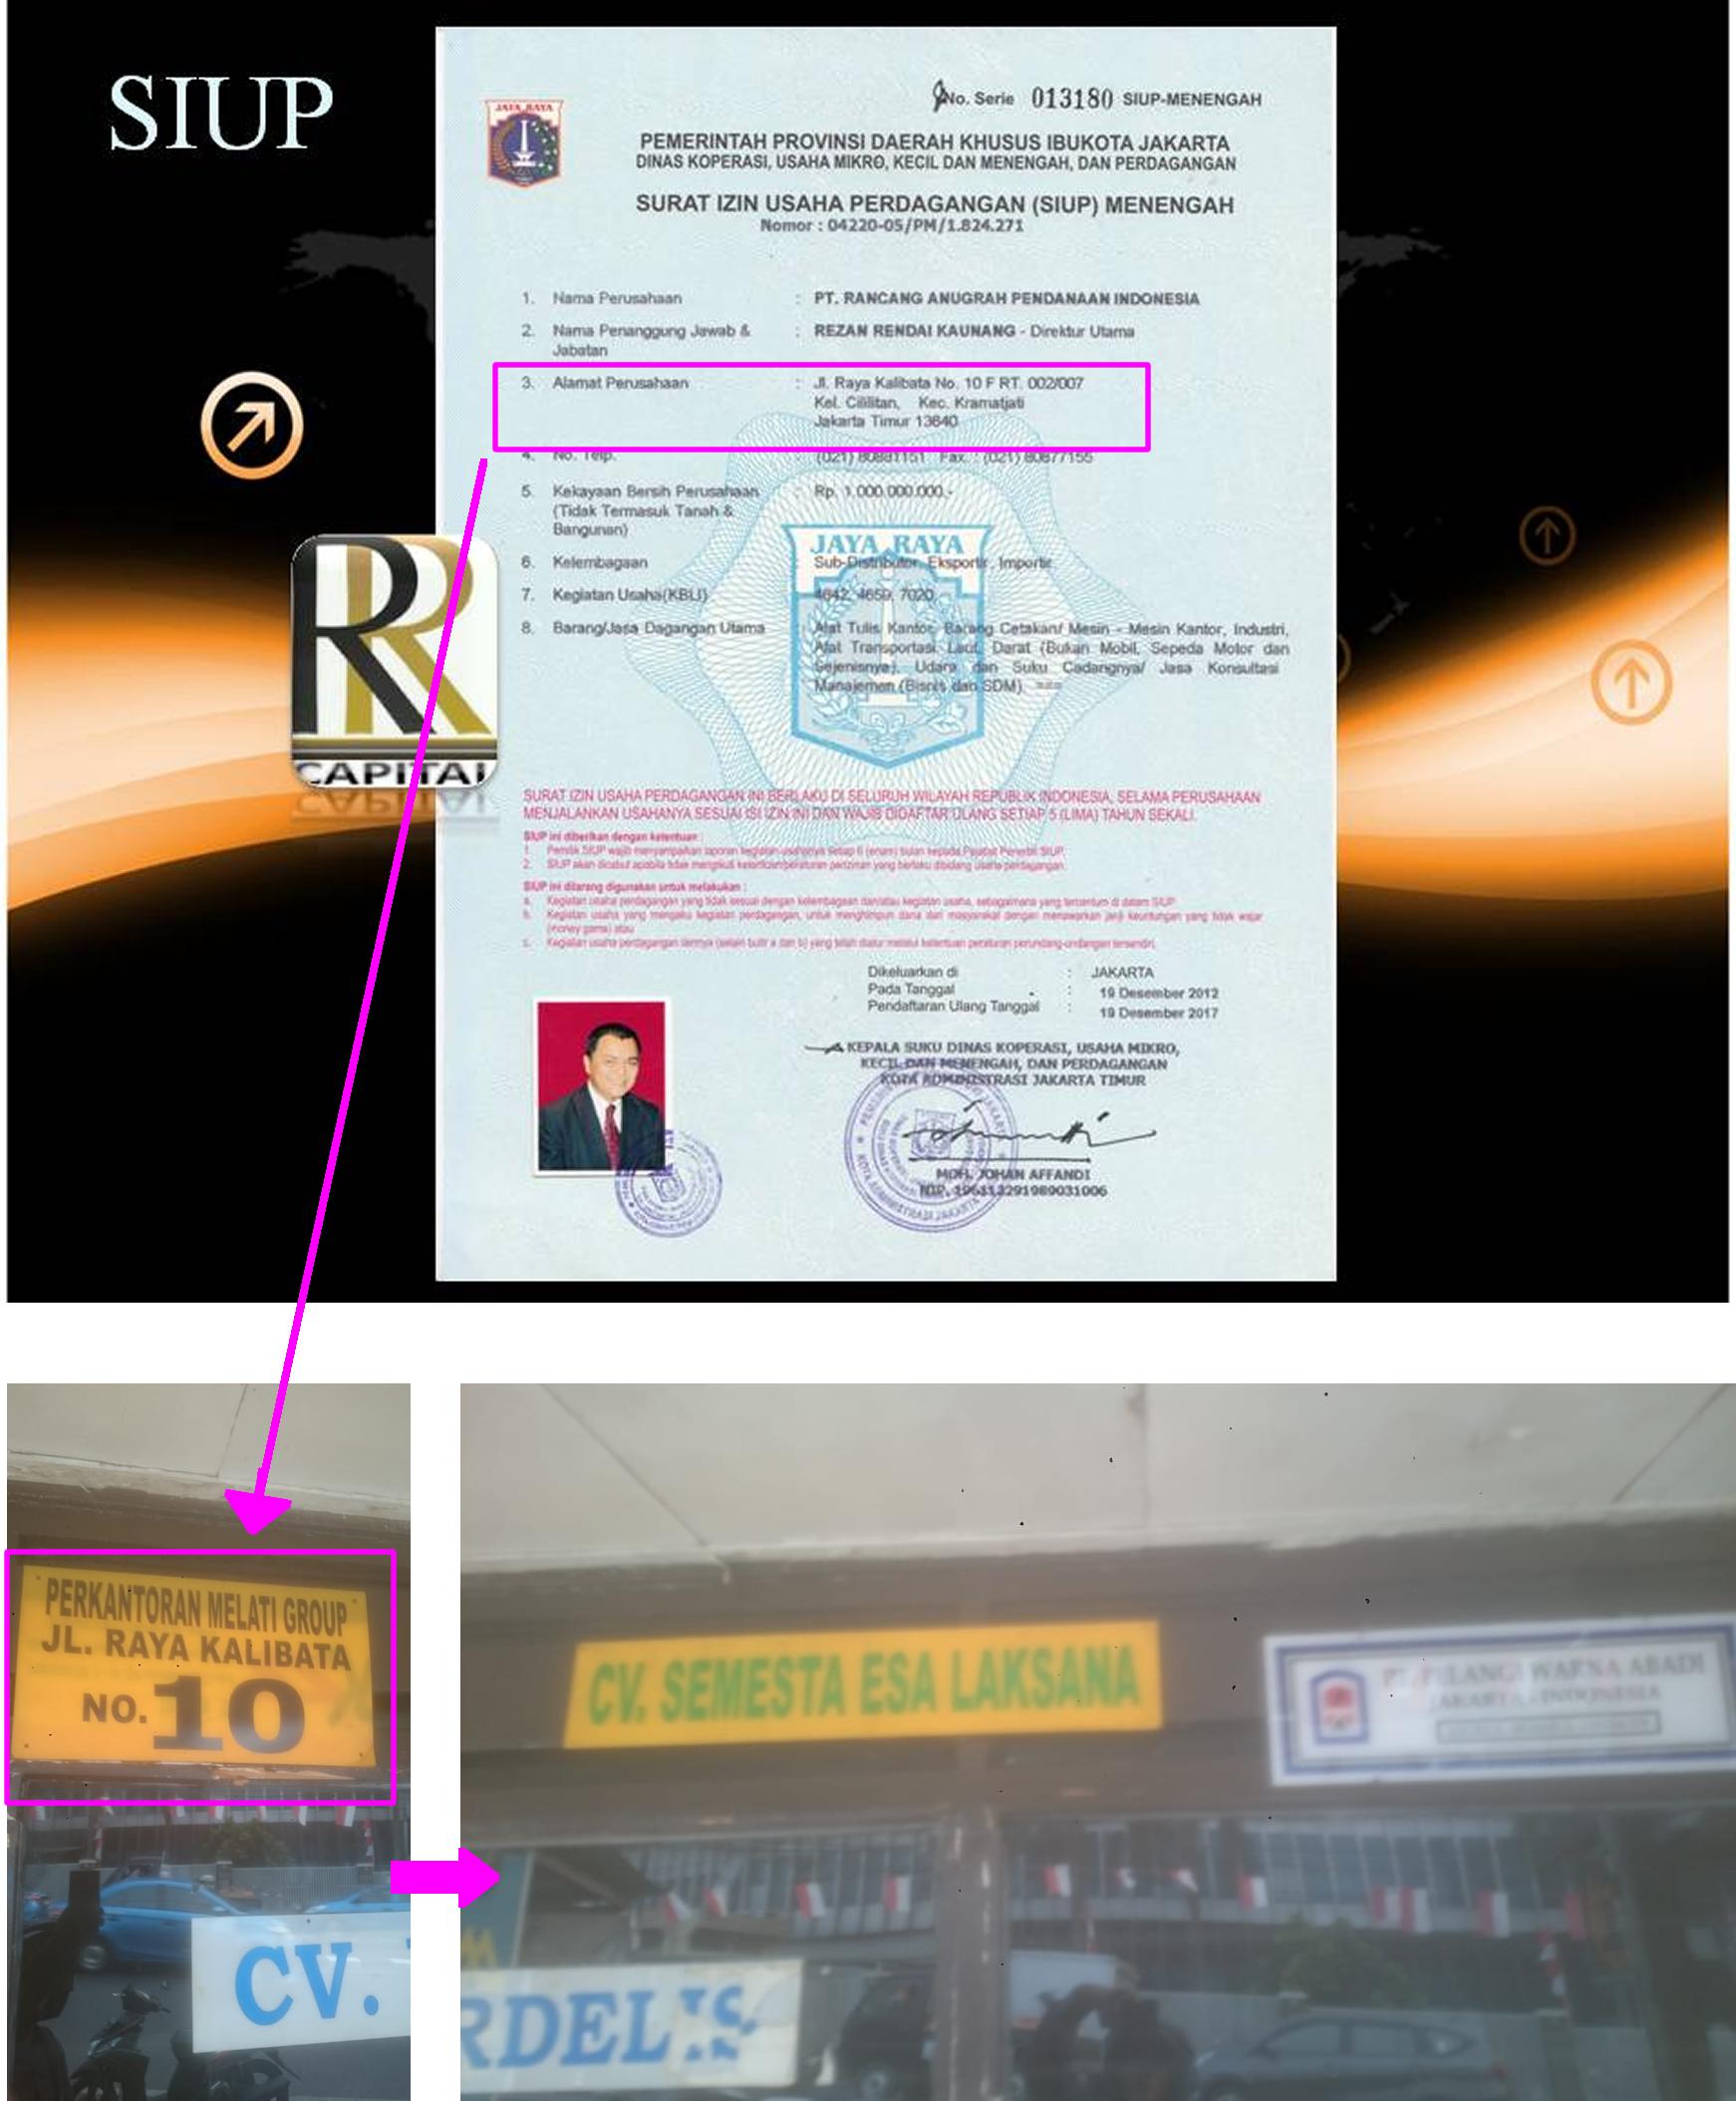 Kasus Penipuan RR Capital Rezan Kaunang Herru Dhanu Indarta 2